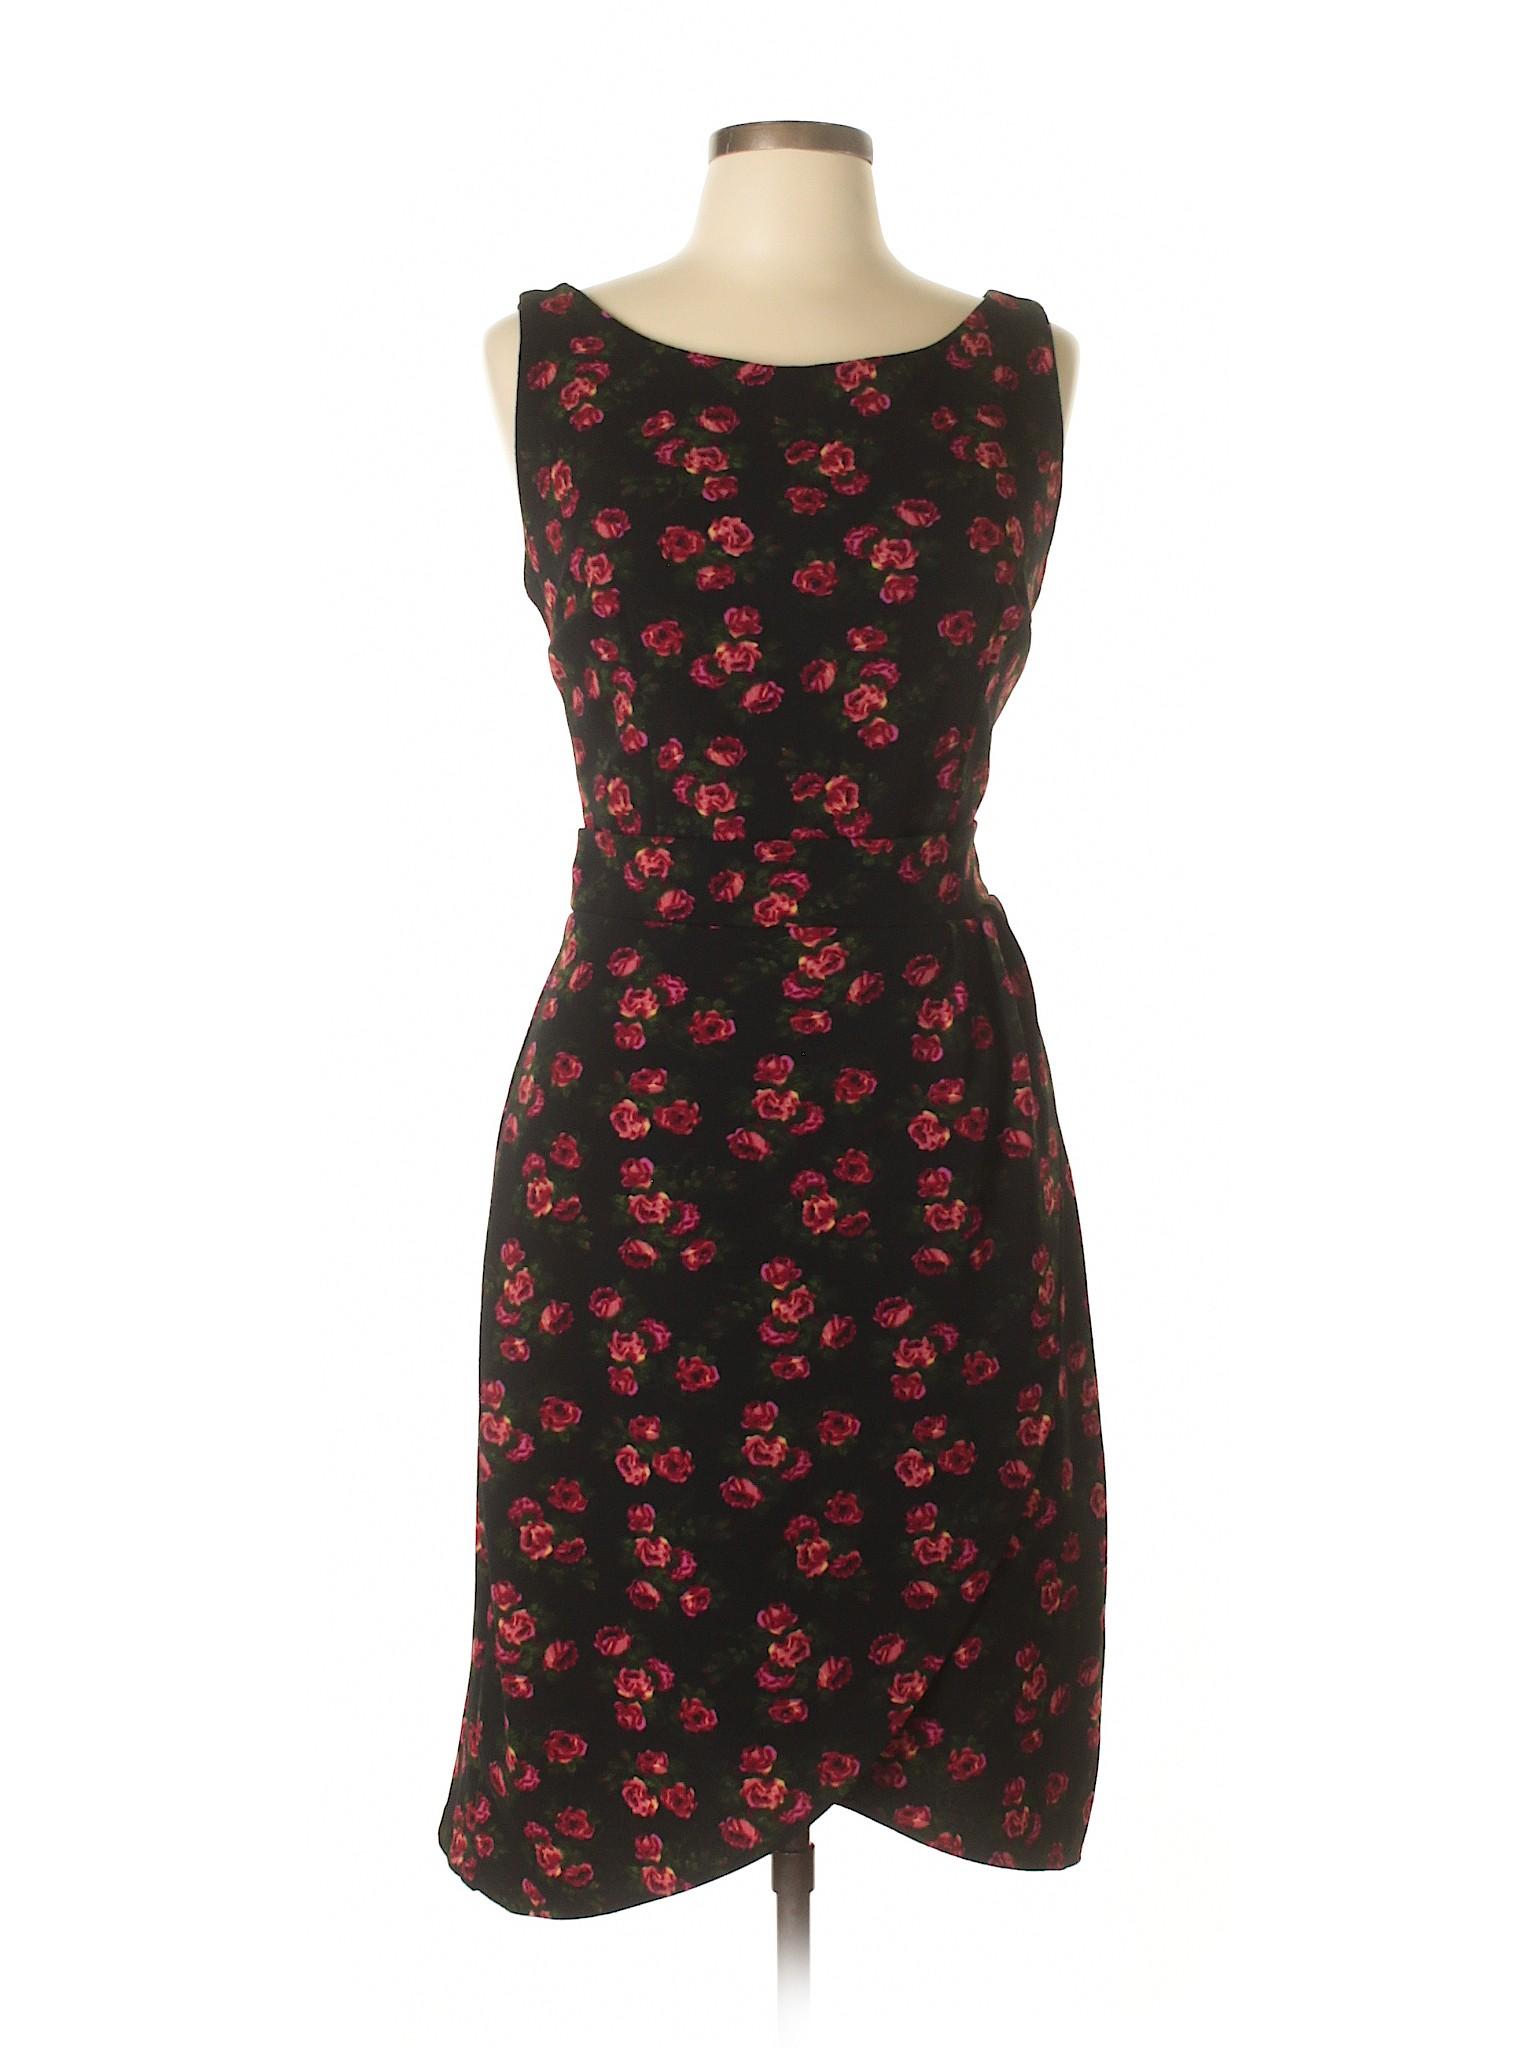 Dress Selling Heartz Casual of Queen wqFx7gT6